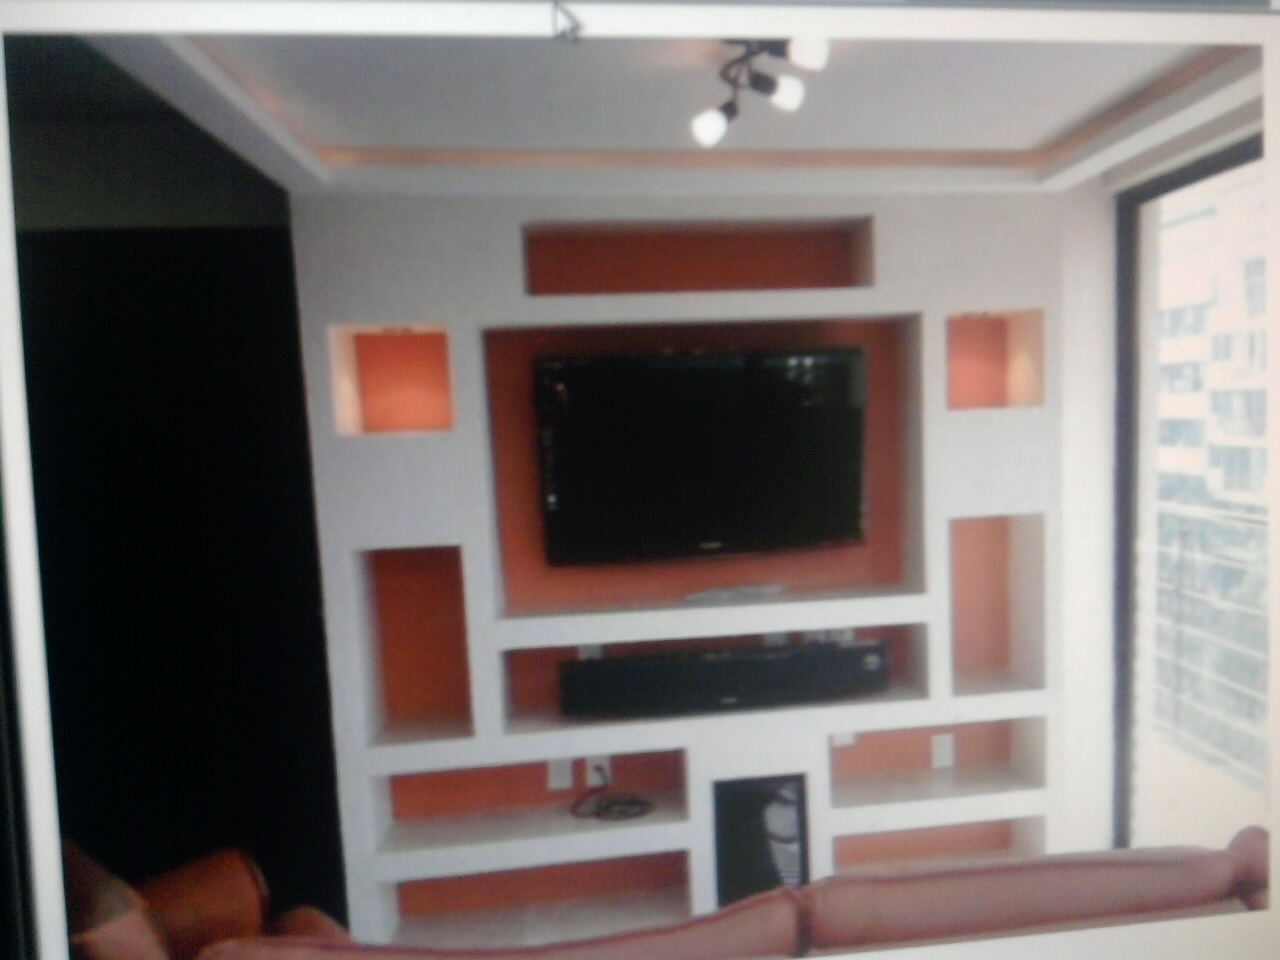 Dcourt&Decora: Dcourt&Decora Muebles decorativos